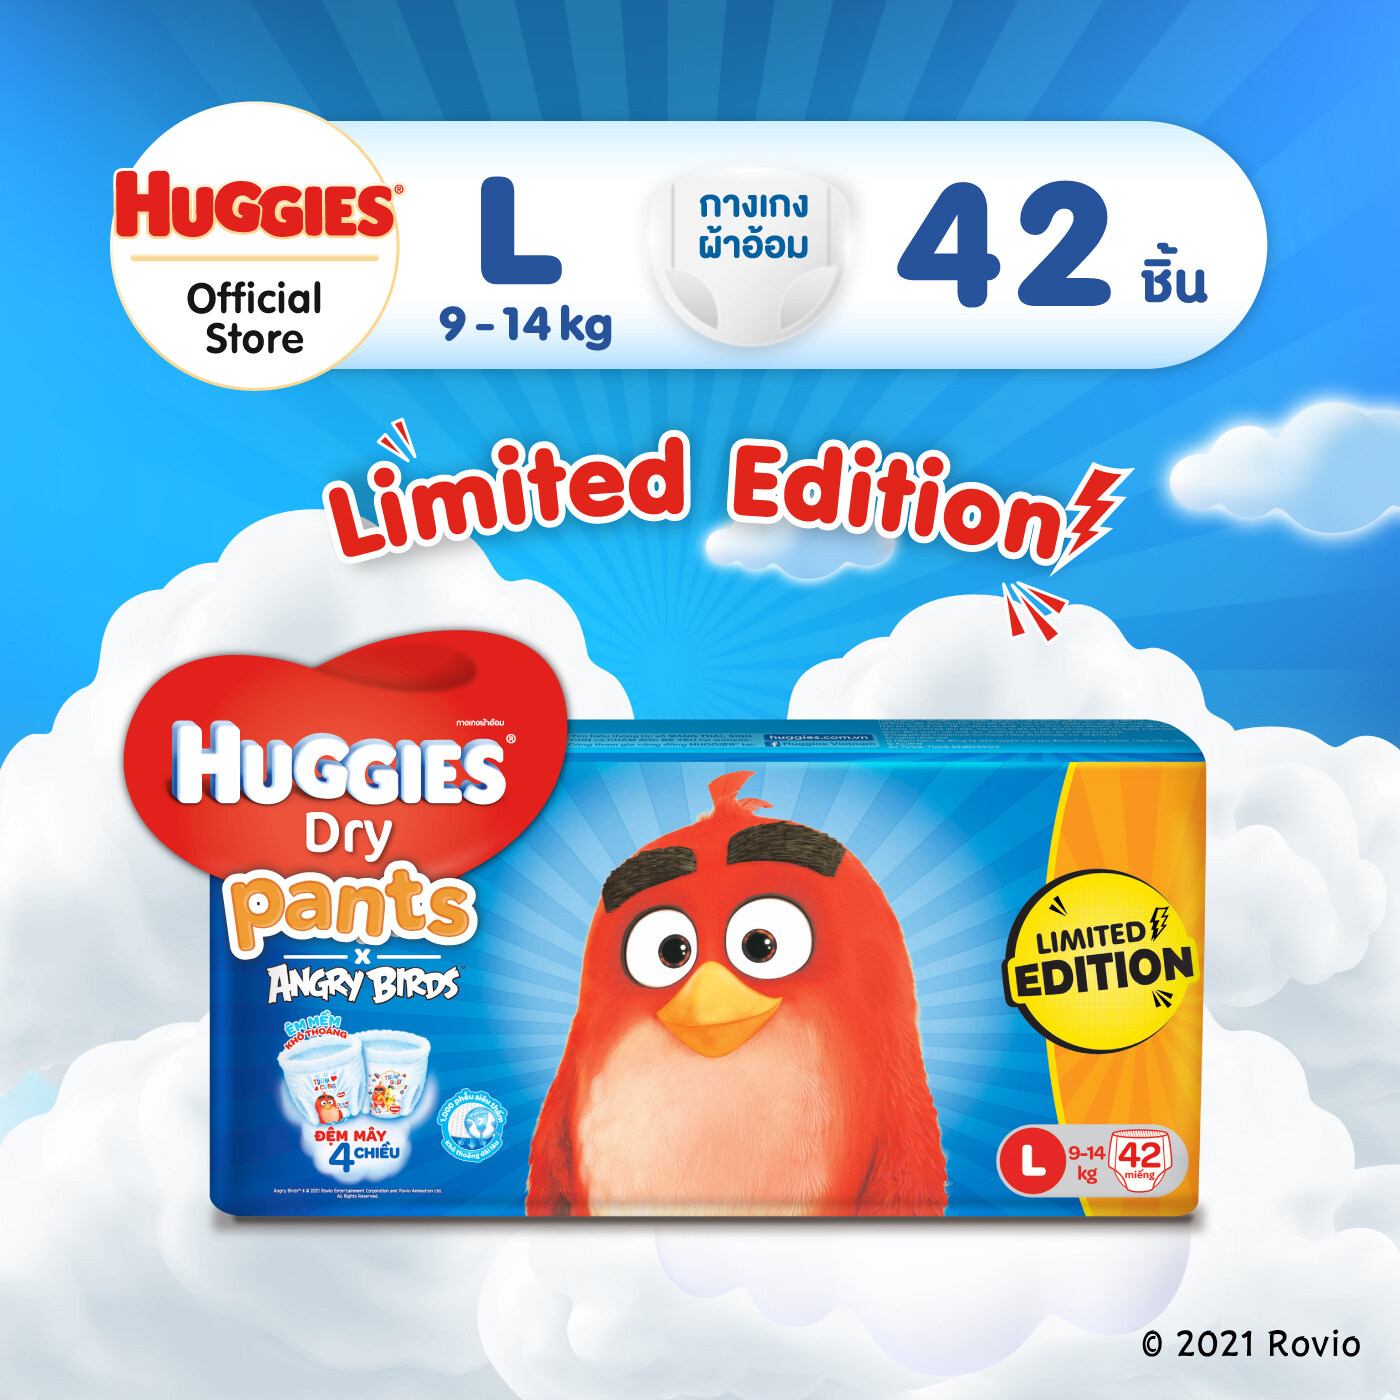 Limited Edition! Huggies Dry Pants Angry Birds [L] กางเกงผ้าอ้อมเด็ก ฮักกี้ส์ ดราย แองกรี้ เบิร์ด ไซส์ L 42 ชิ้น (แพ็คพิเศษจำนวนจำกัด)